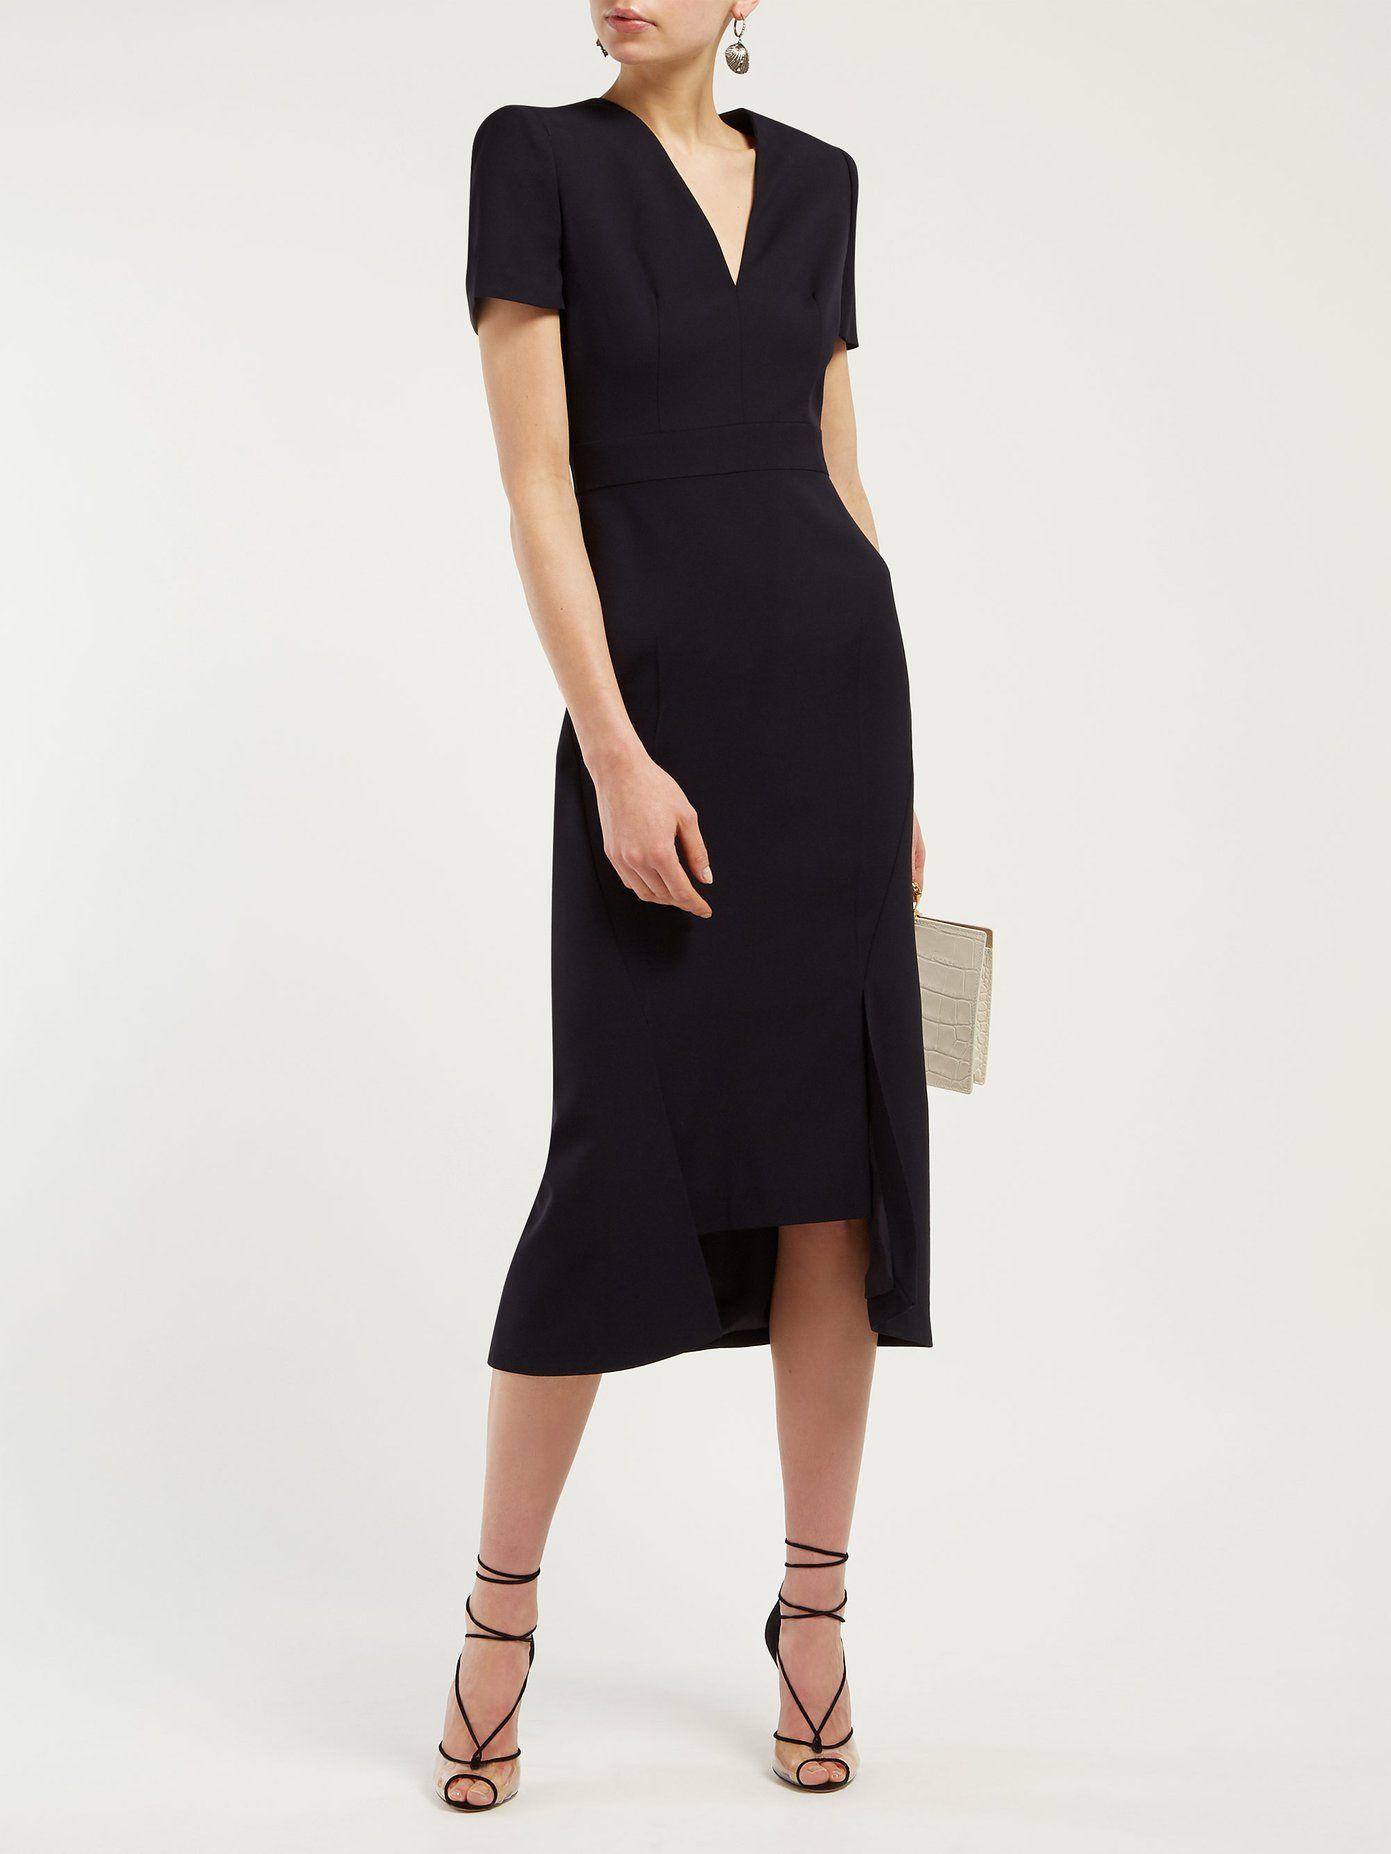 Padded Tailored Twill Midi Dress Alexander Mcqueen